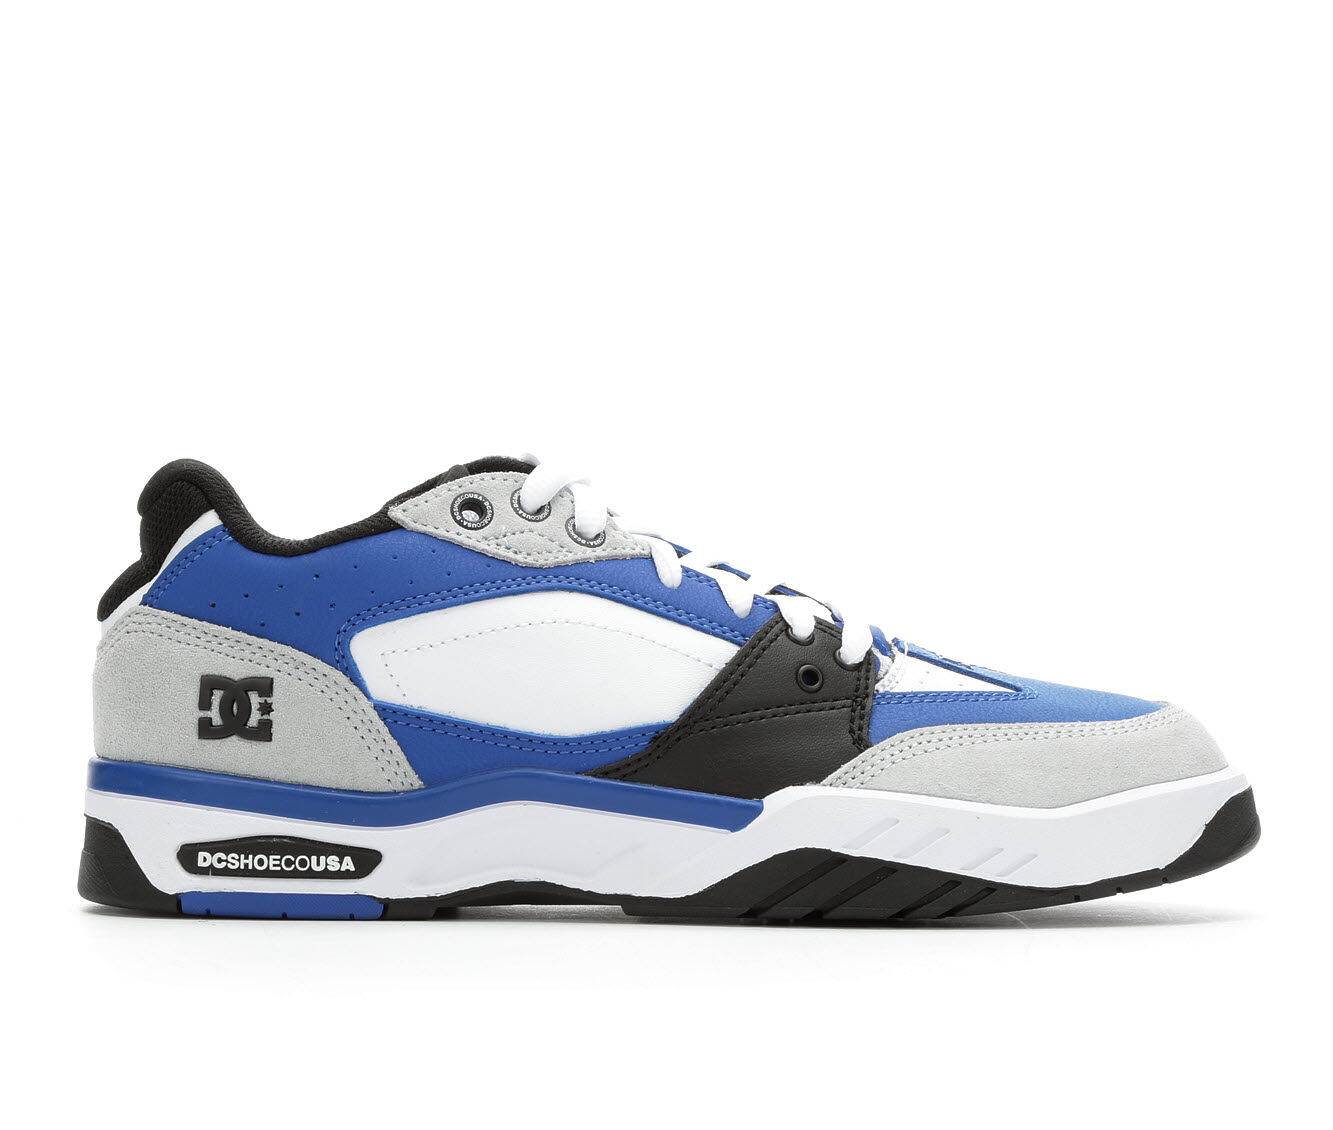 uk shoes_kd1850